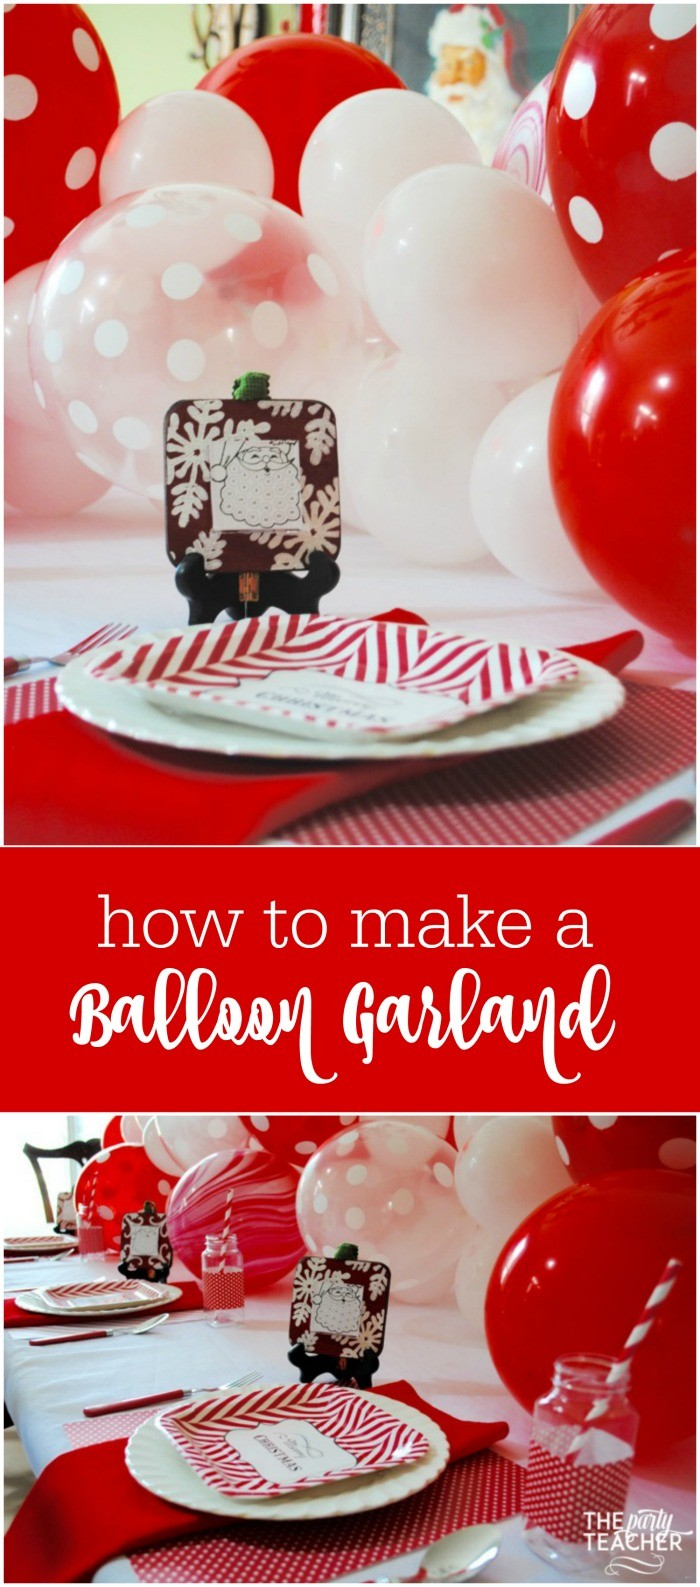 Tutorial How To Make A Balloon Garland The Party Teacher